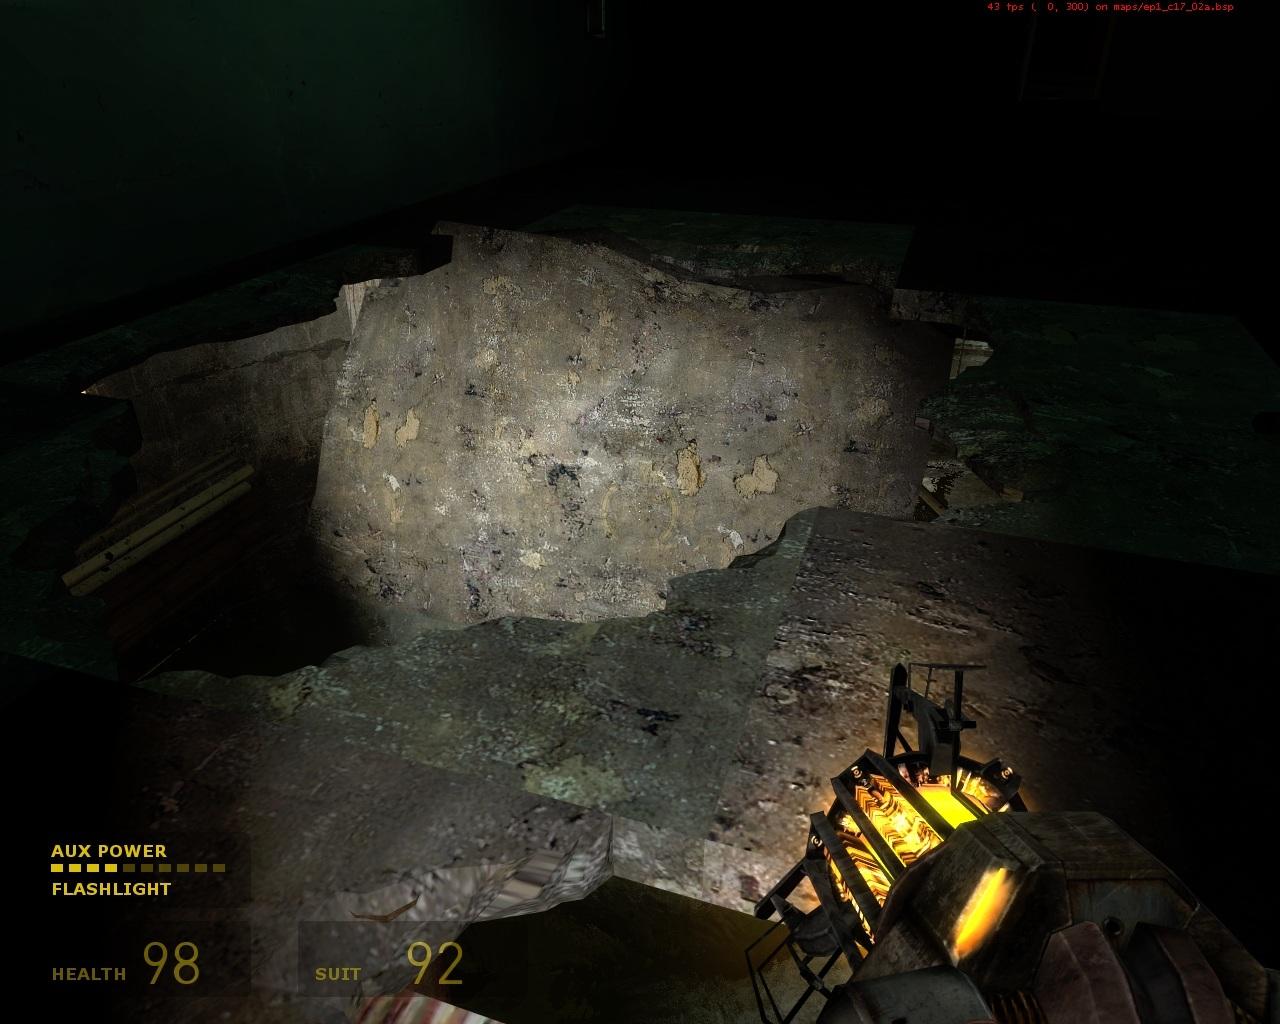 ep1_c17_02a0006.jpg - Half-Life 2